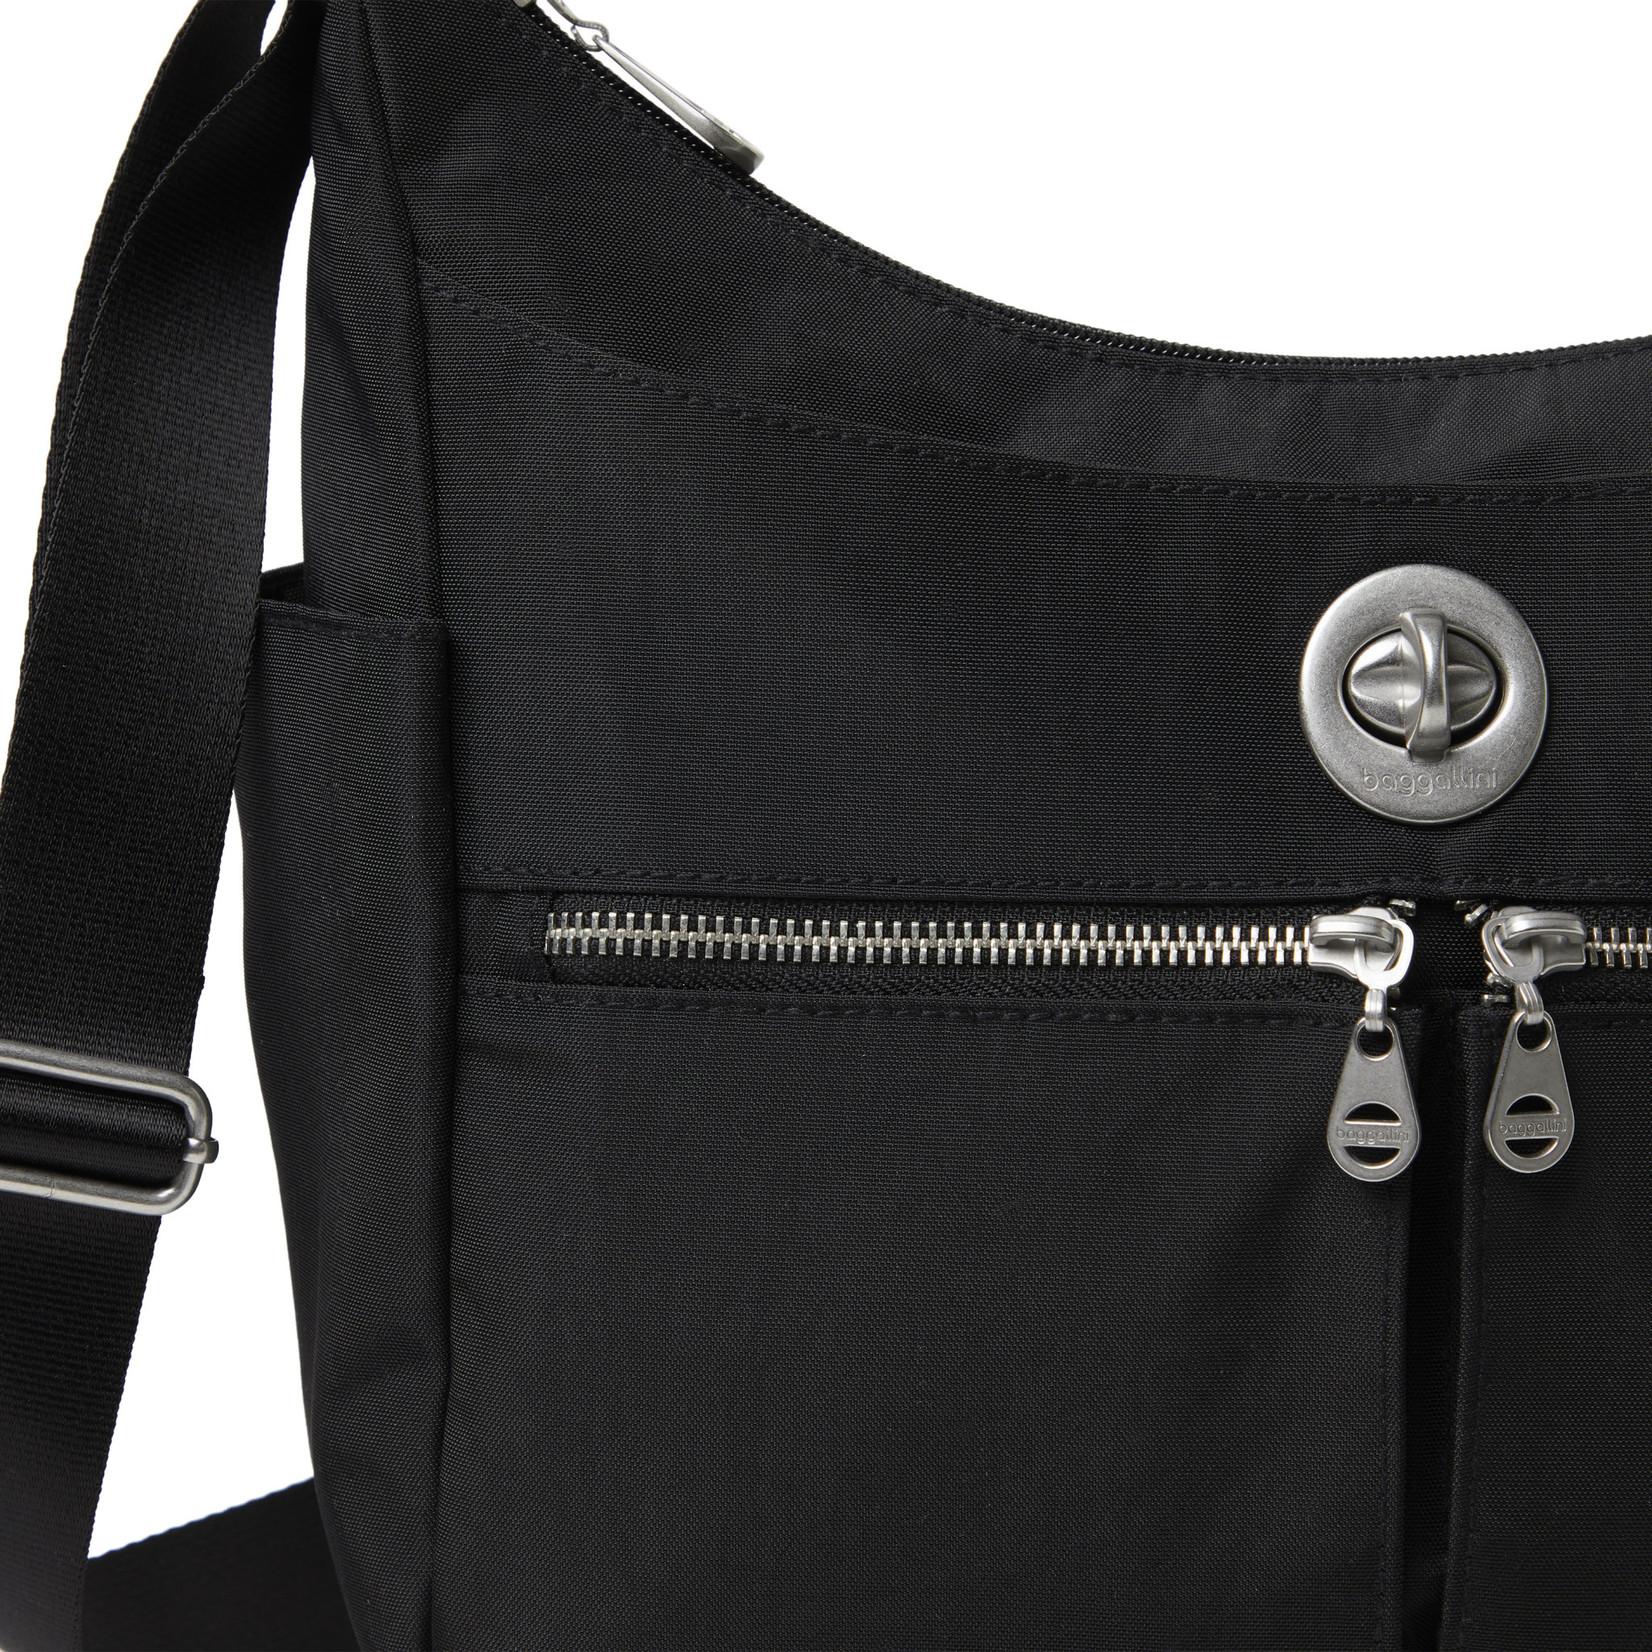 Baggallini Bristol RFID Crossbody Bag - Black